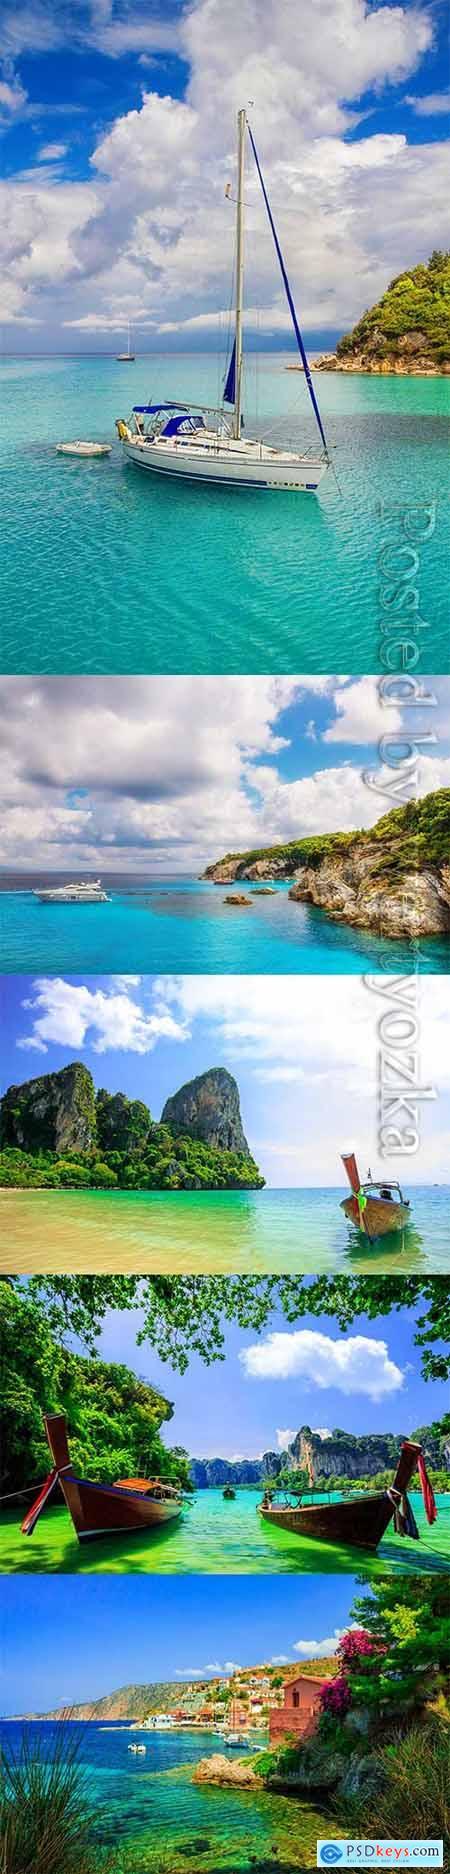 Landscapes coast stock photos